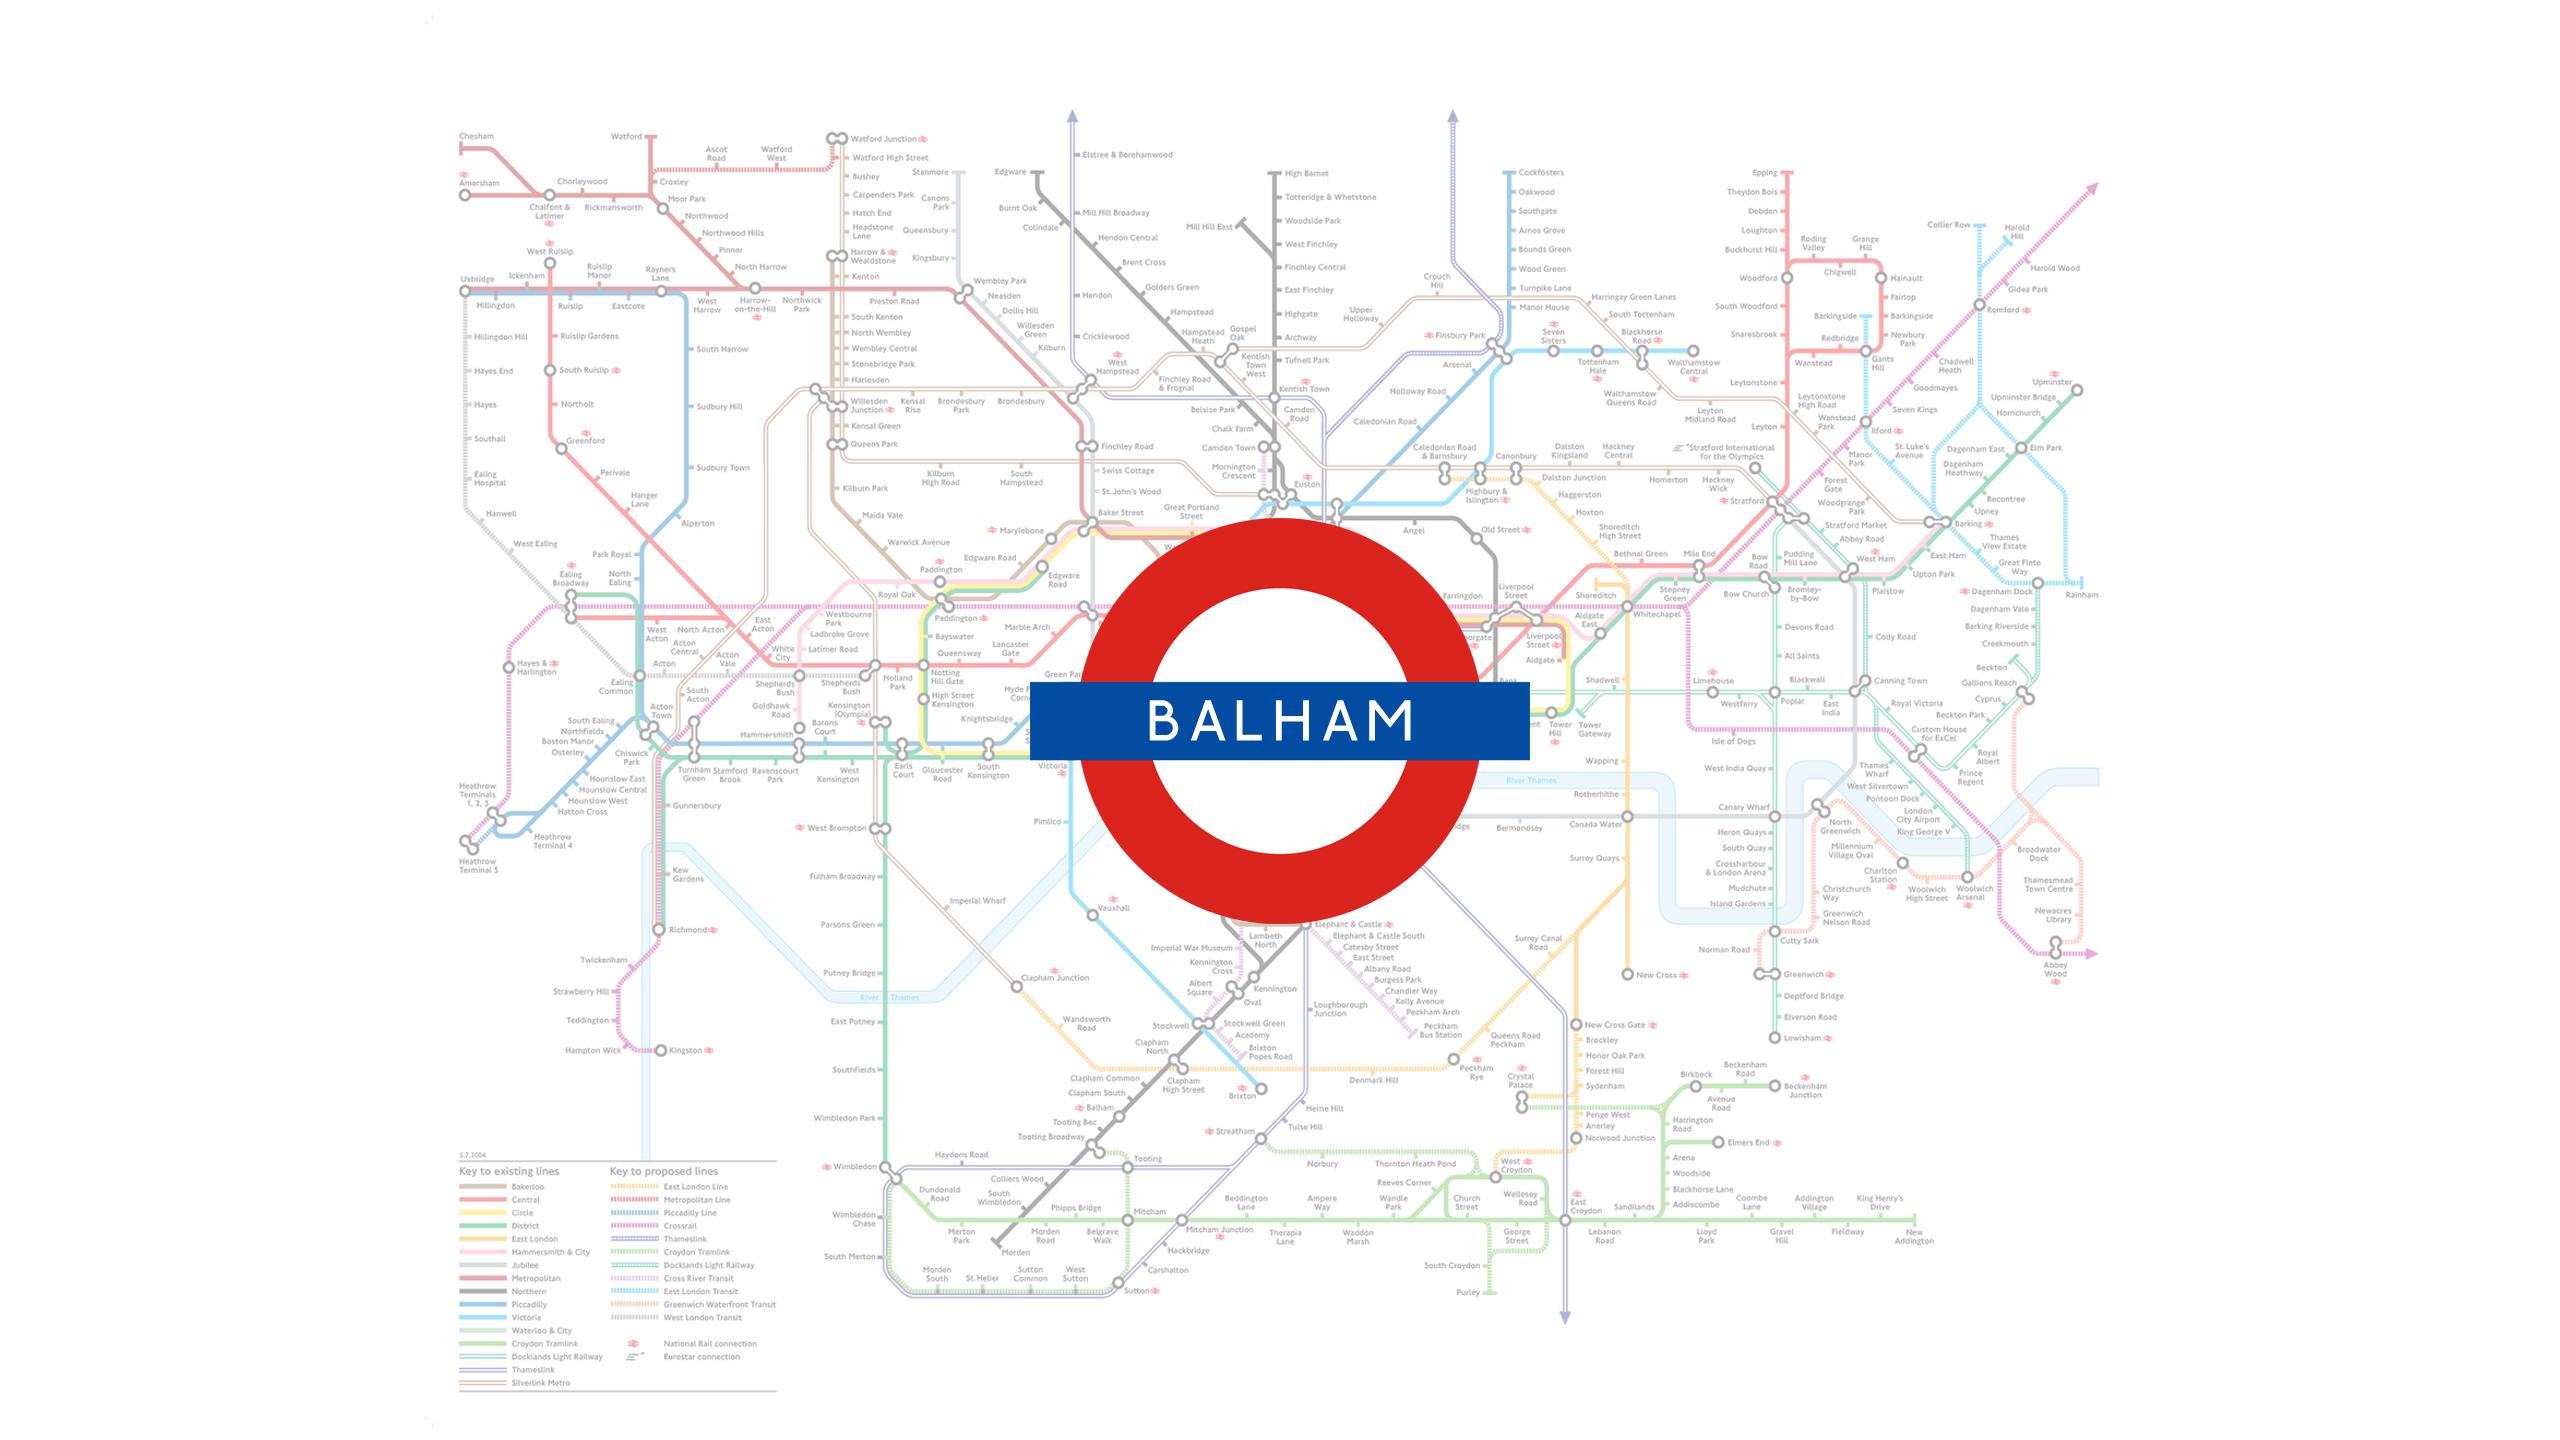 Balham (Map)